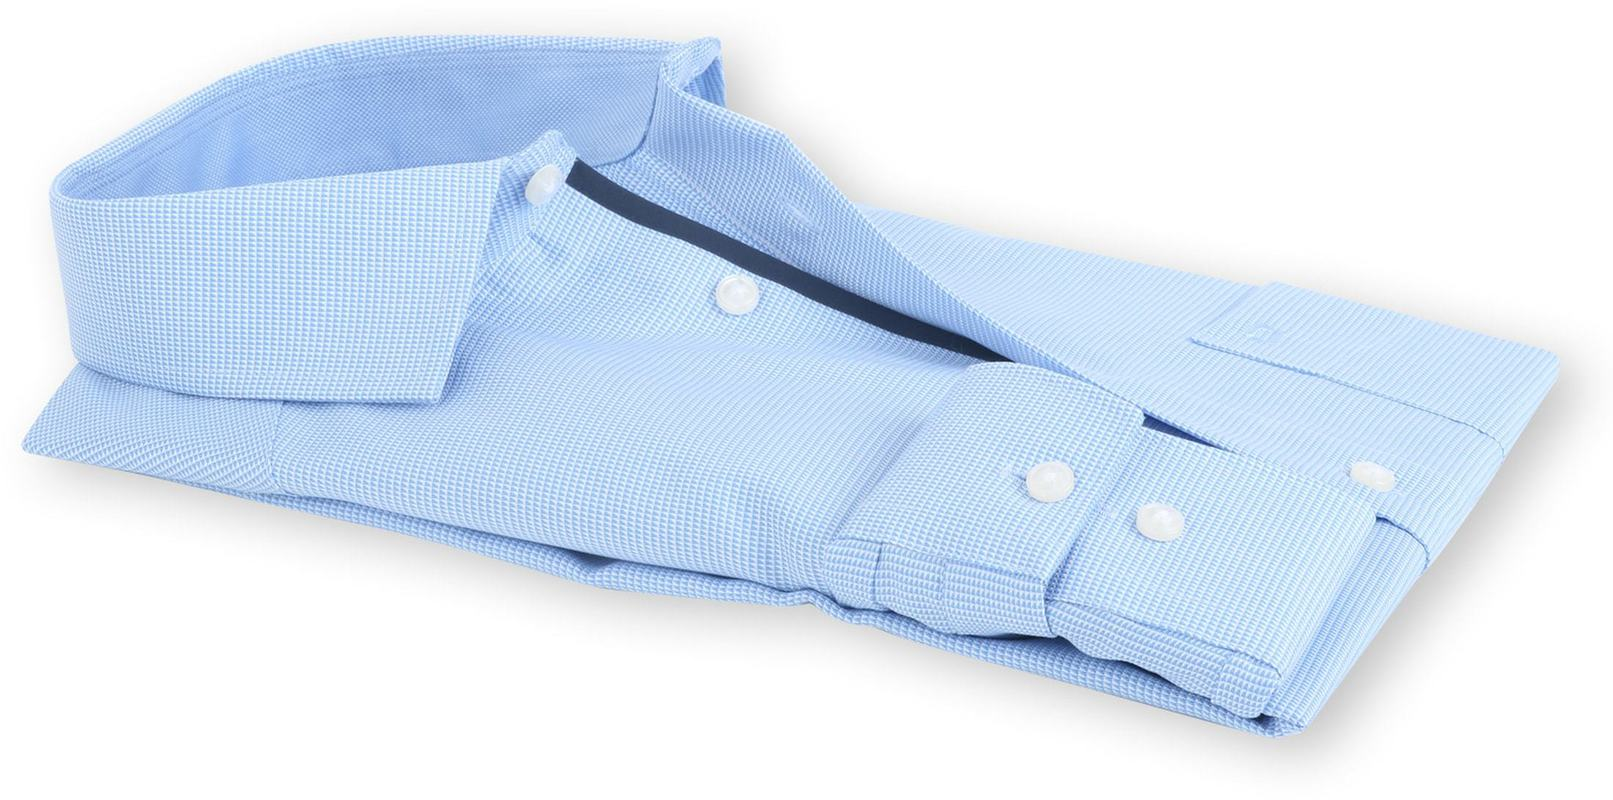 OLYMP Luxor Modern Fit Overhemd Blauw Dessin - Blauw maat 43